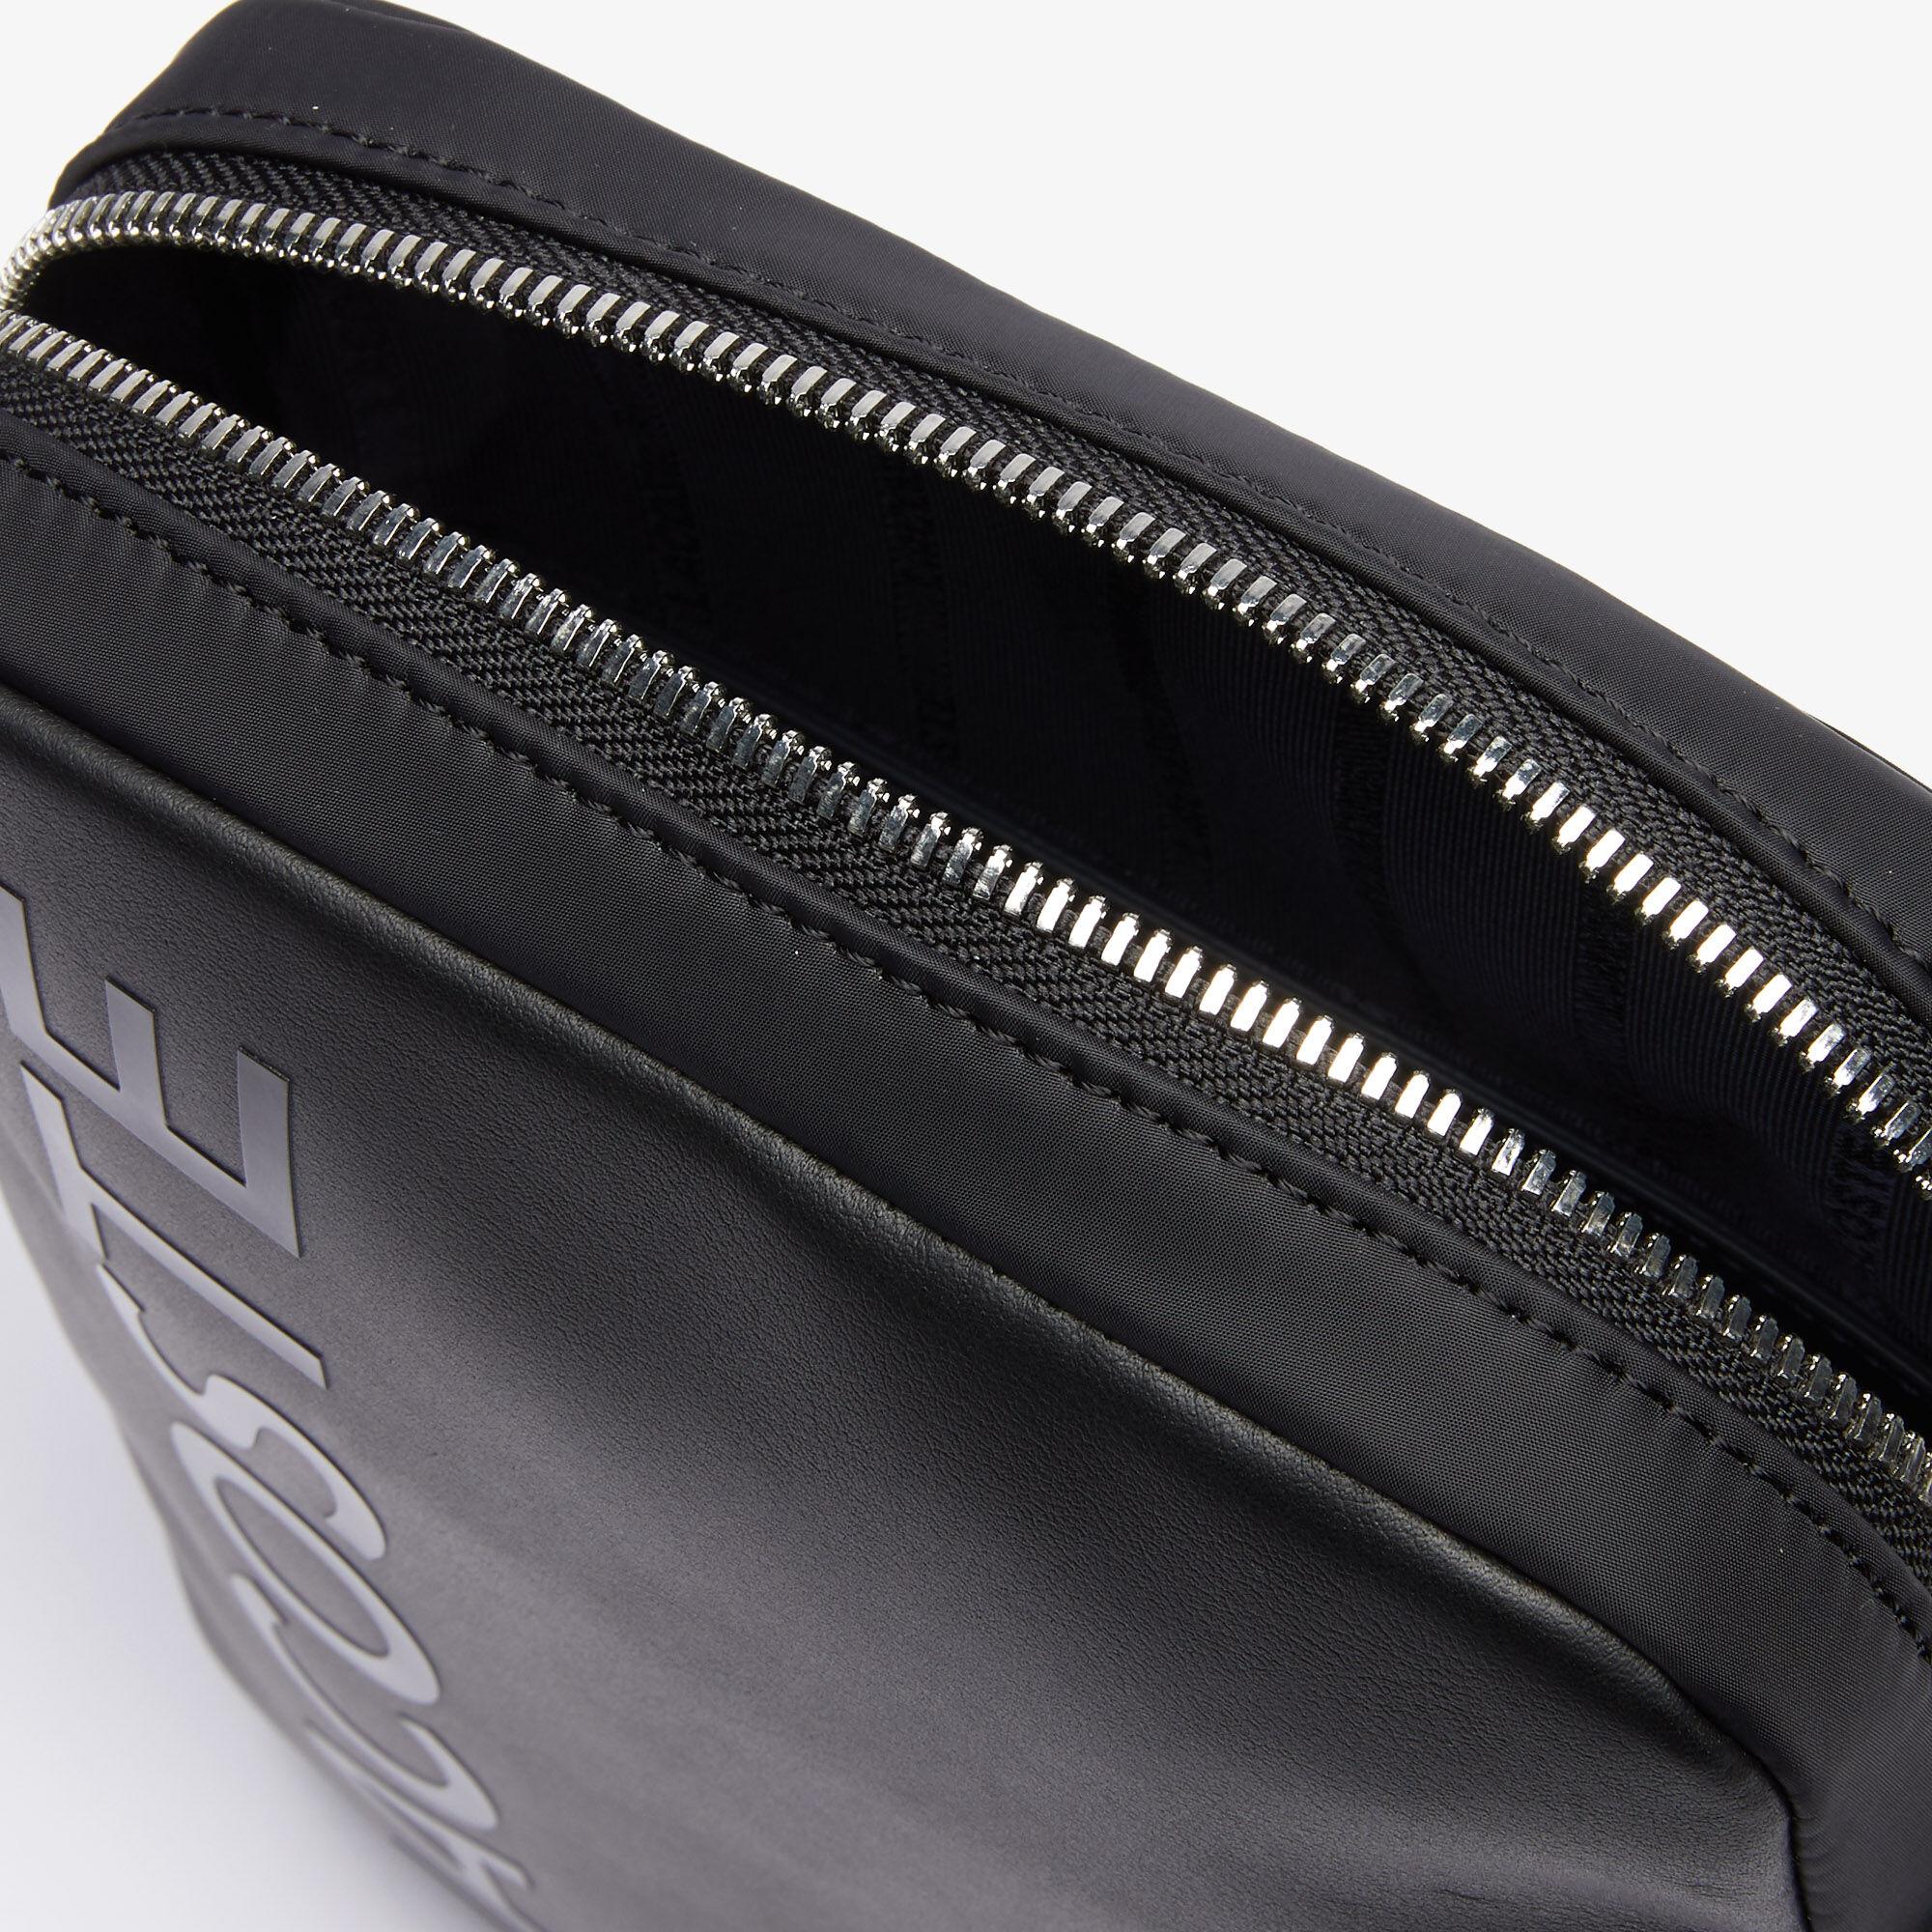 Men's L.12.12 Signature Leather Cross Body Bag